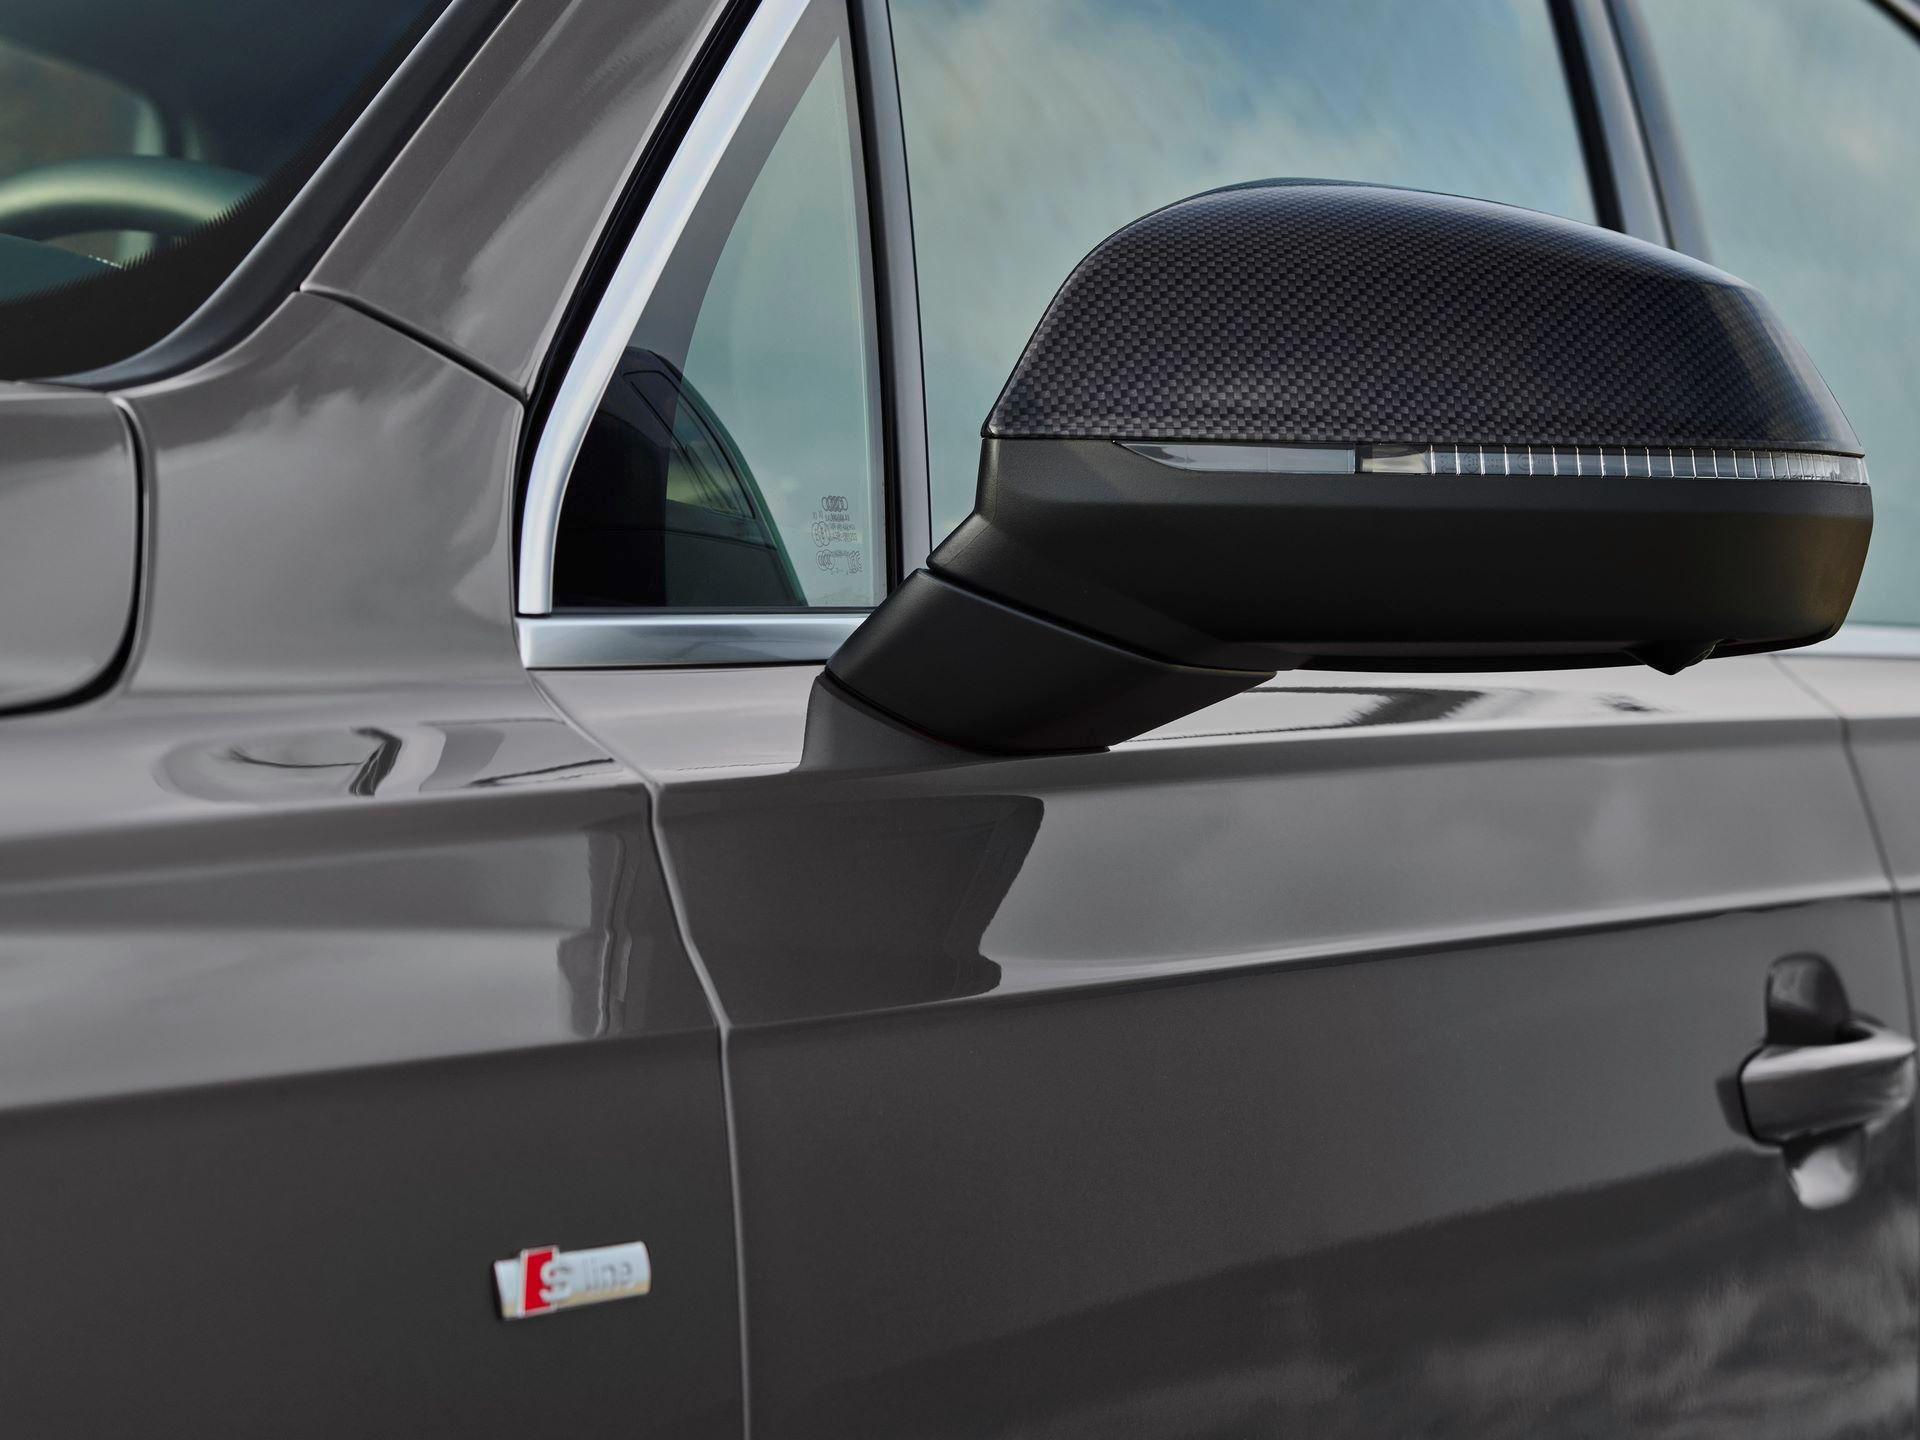 Audi-A4-A5-Q7-Q8-Competition-And-Competition-Plus-Trims-46